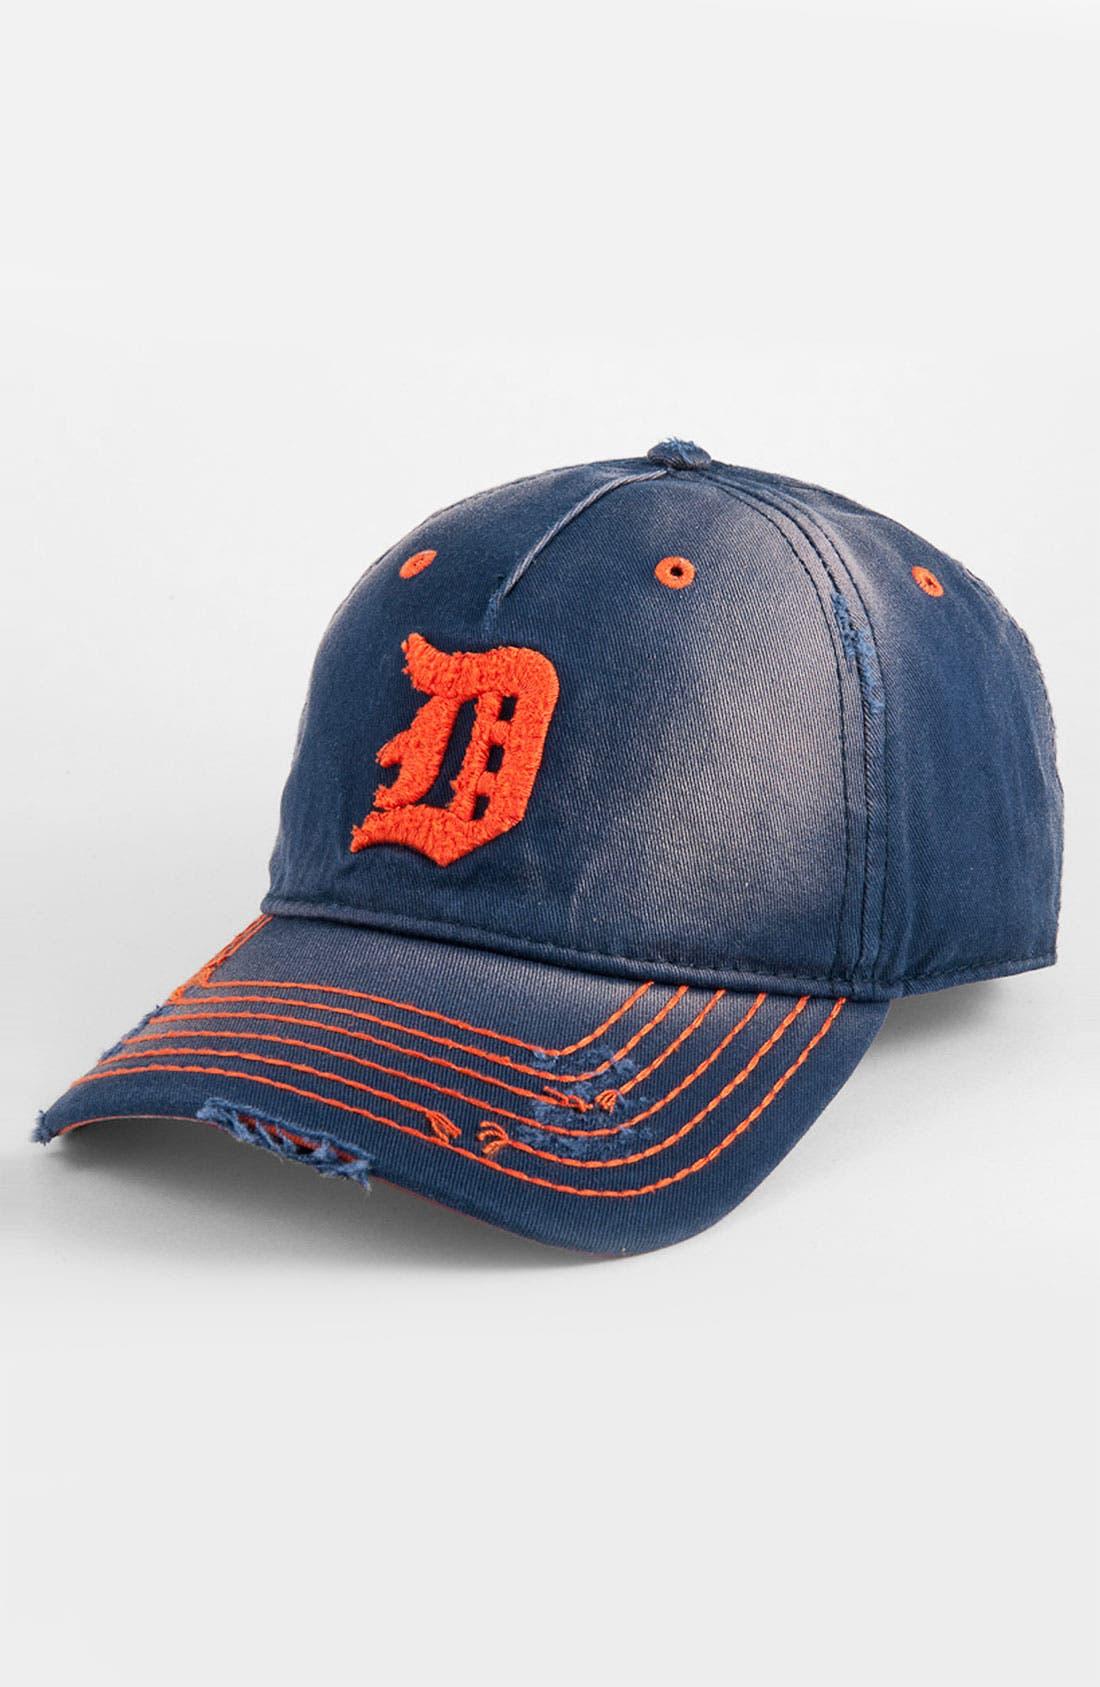 Alternate Image 1 Selected - American Needle 'Detroit Tigers' Distressed Cap